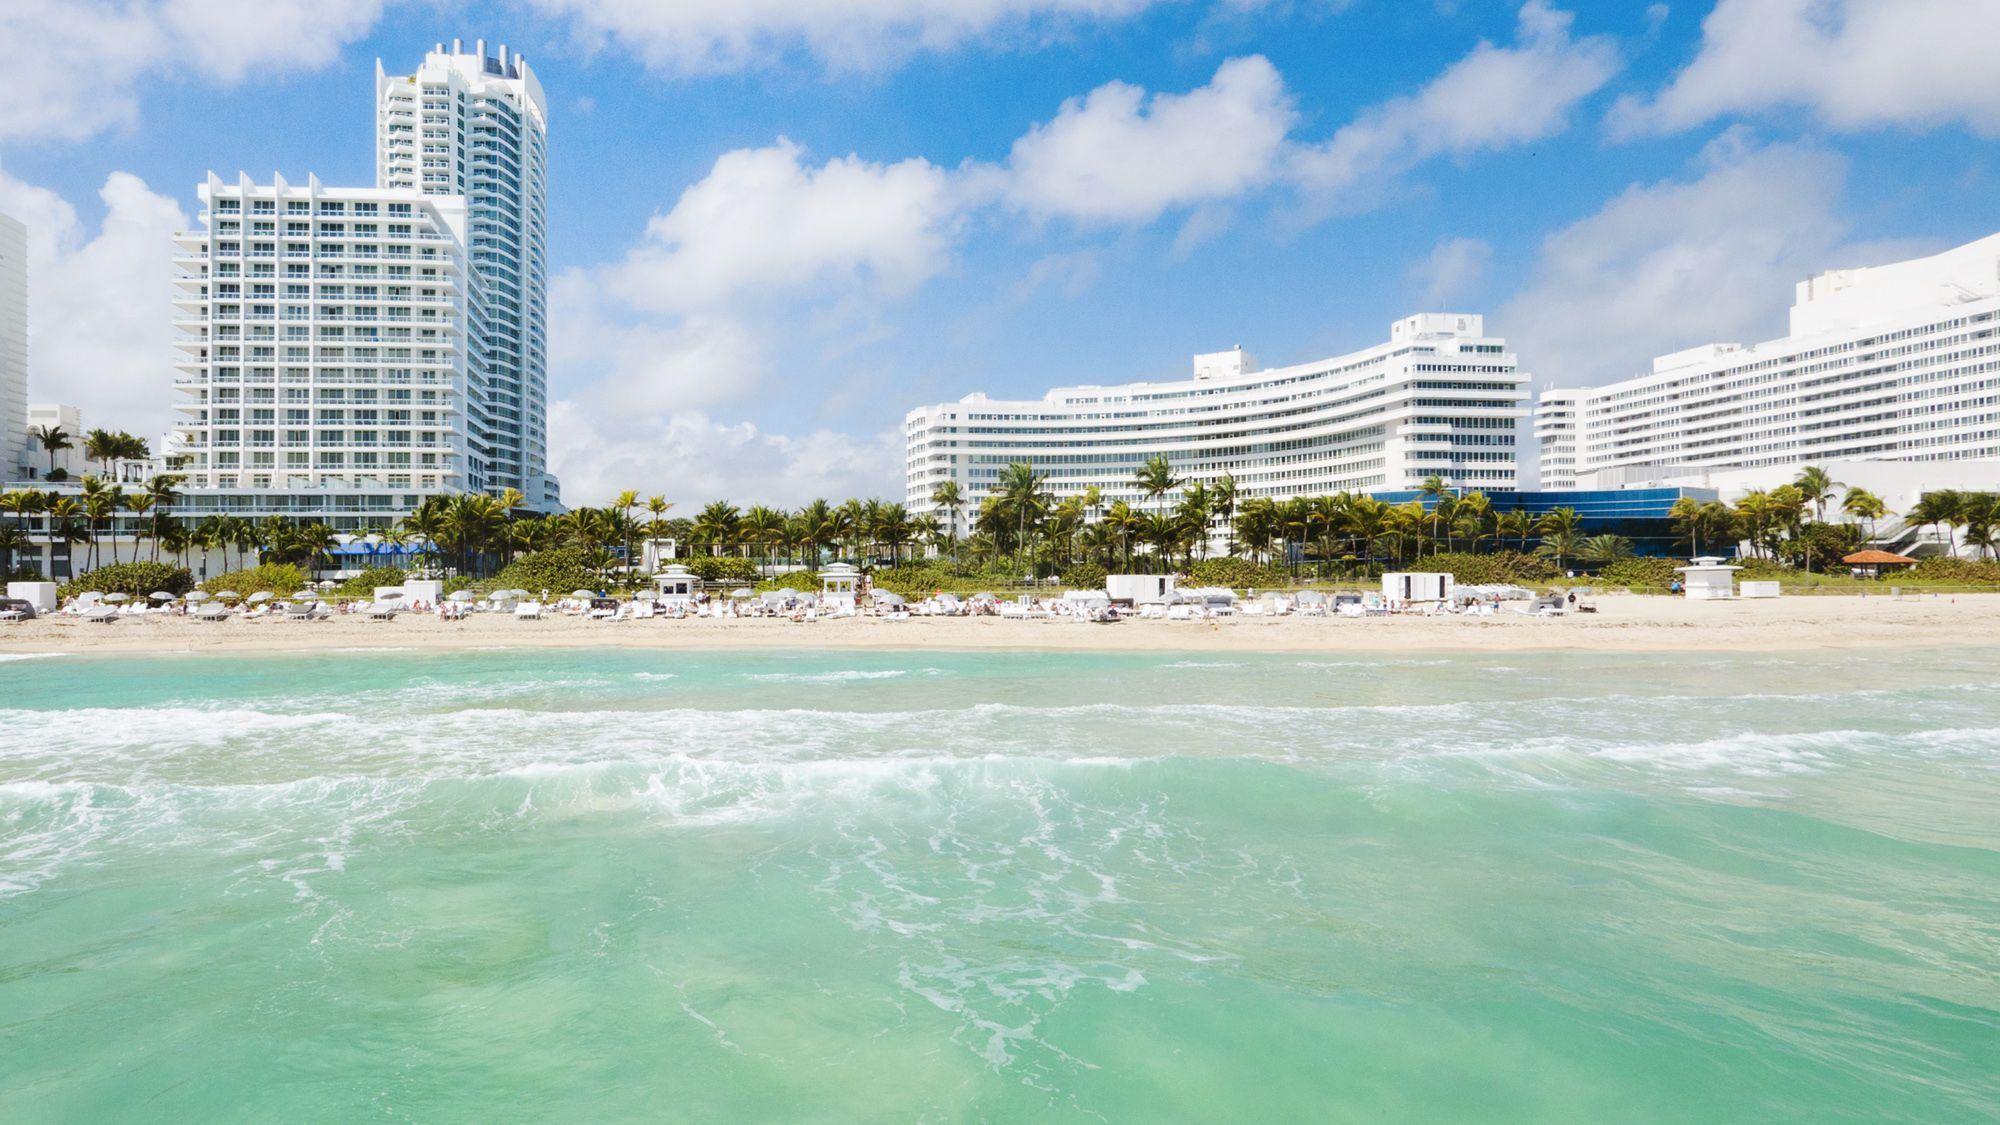 Fontainebleau Miami Beach Hotel Miamibeach Vacation Florida Summervacation